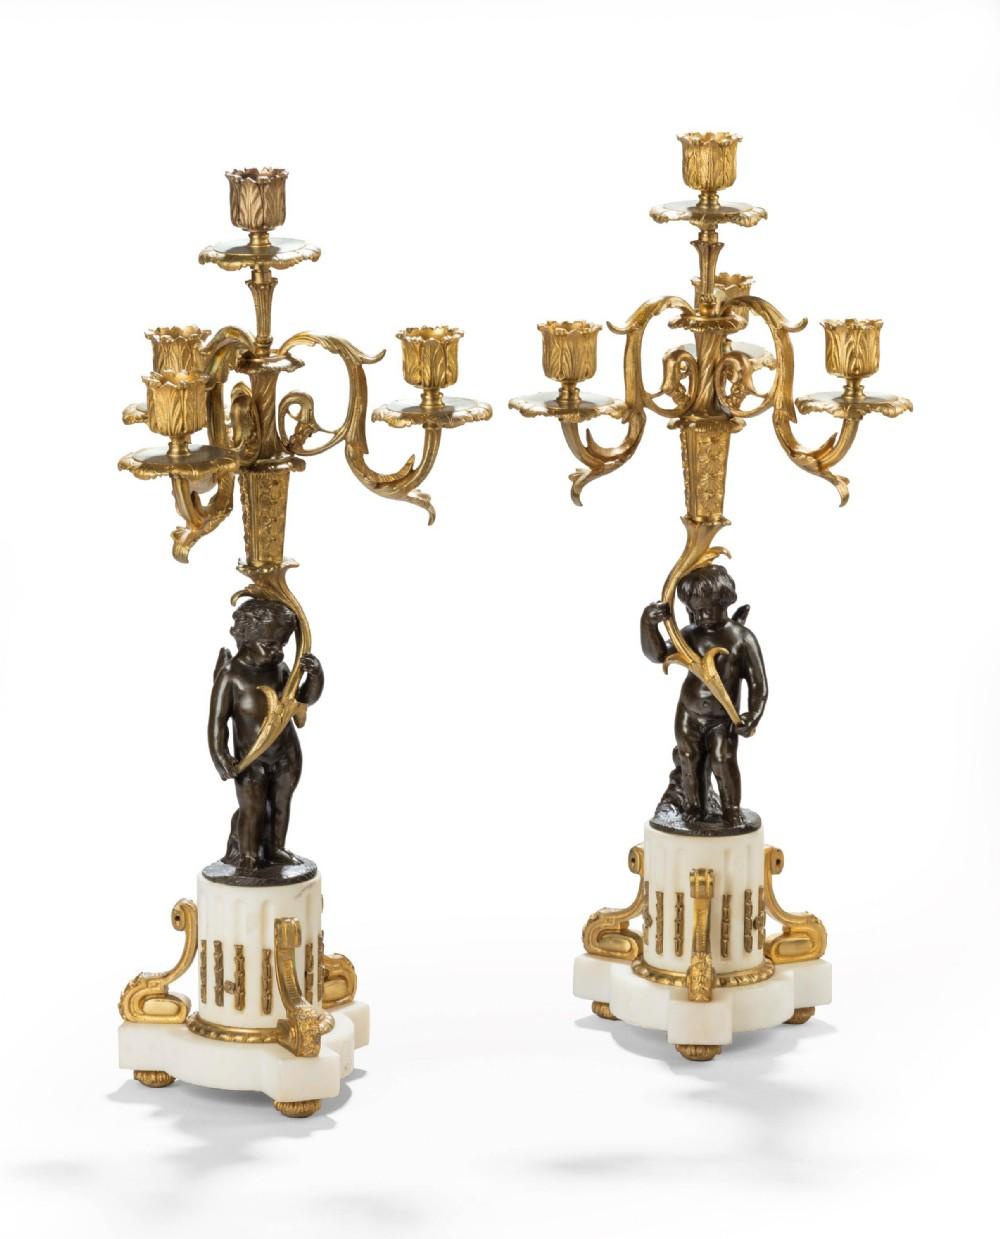 pair of bronze and gilt bronze candelabras